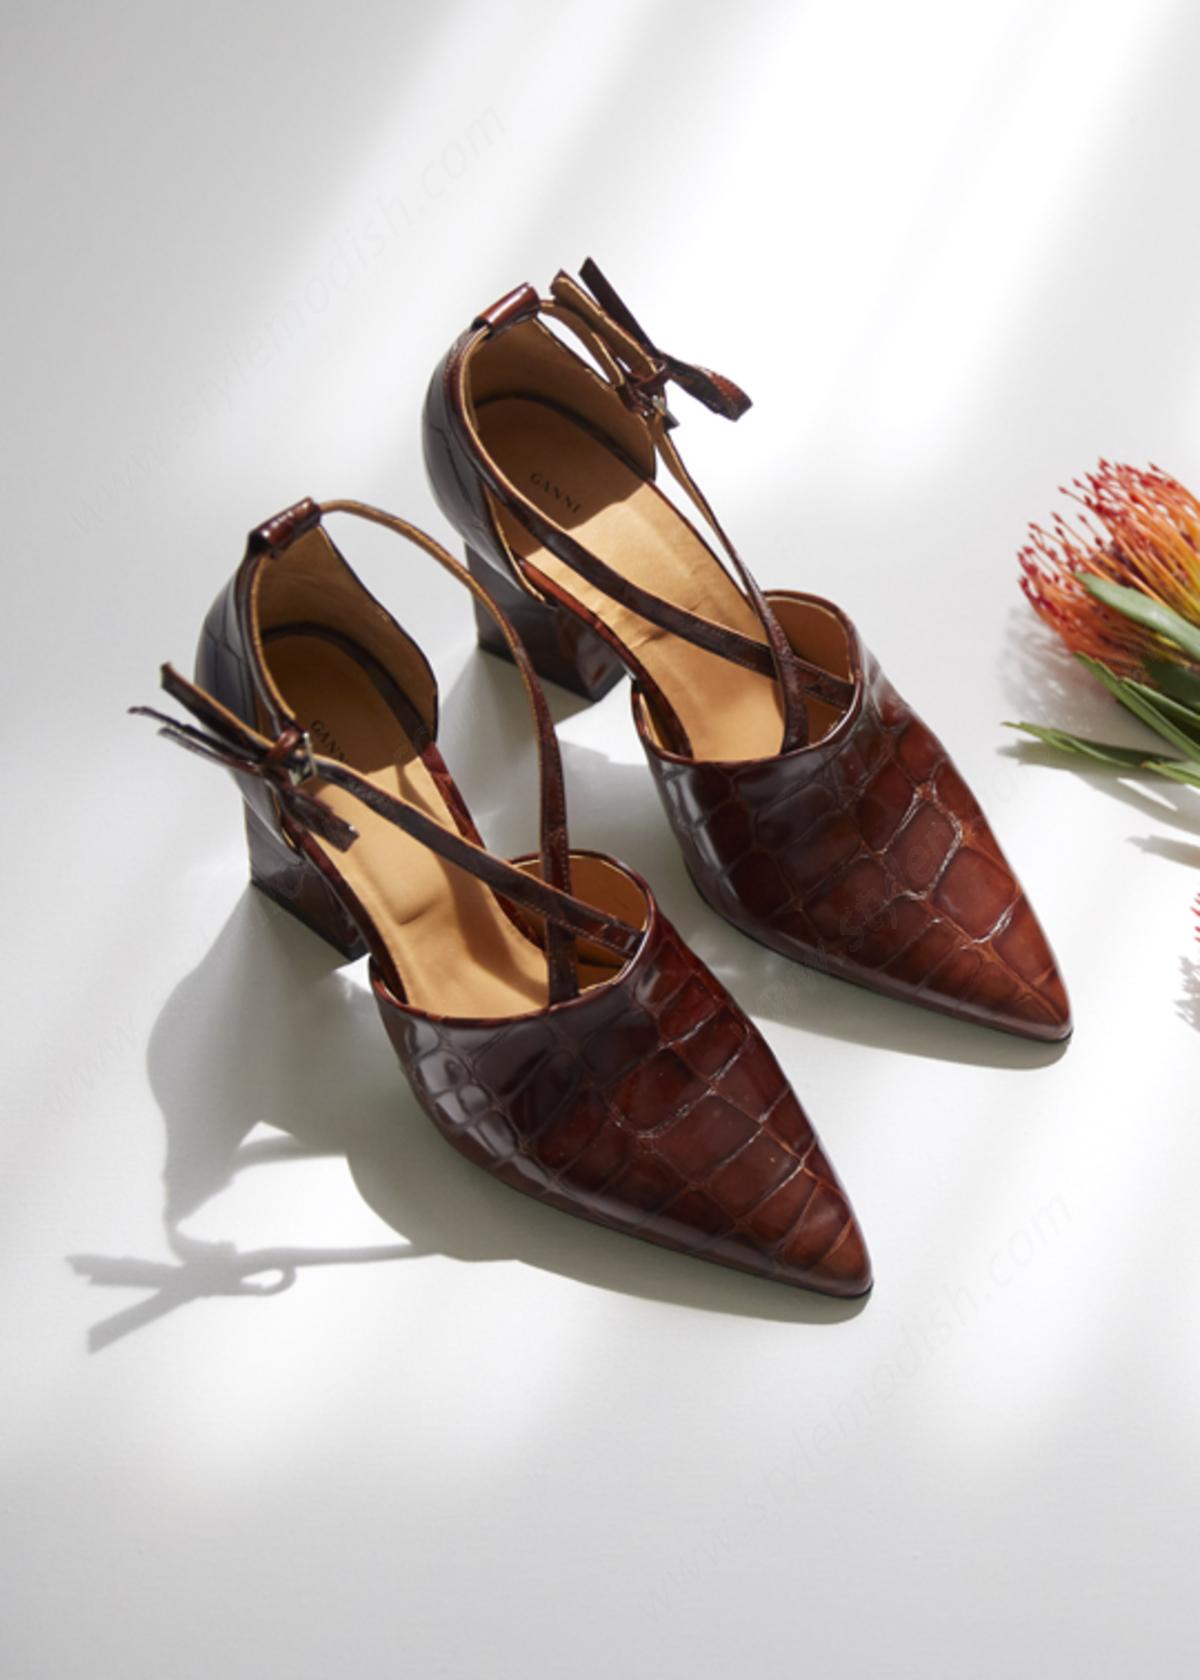 Woman's Ganni Lina Leather Pumps Shoes - Woman's Ganni Lina Leather Pumps Shoes